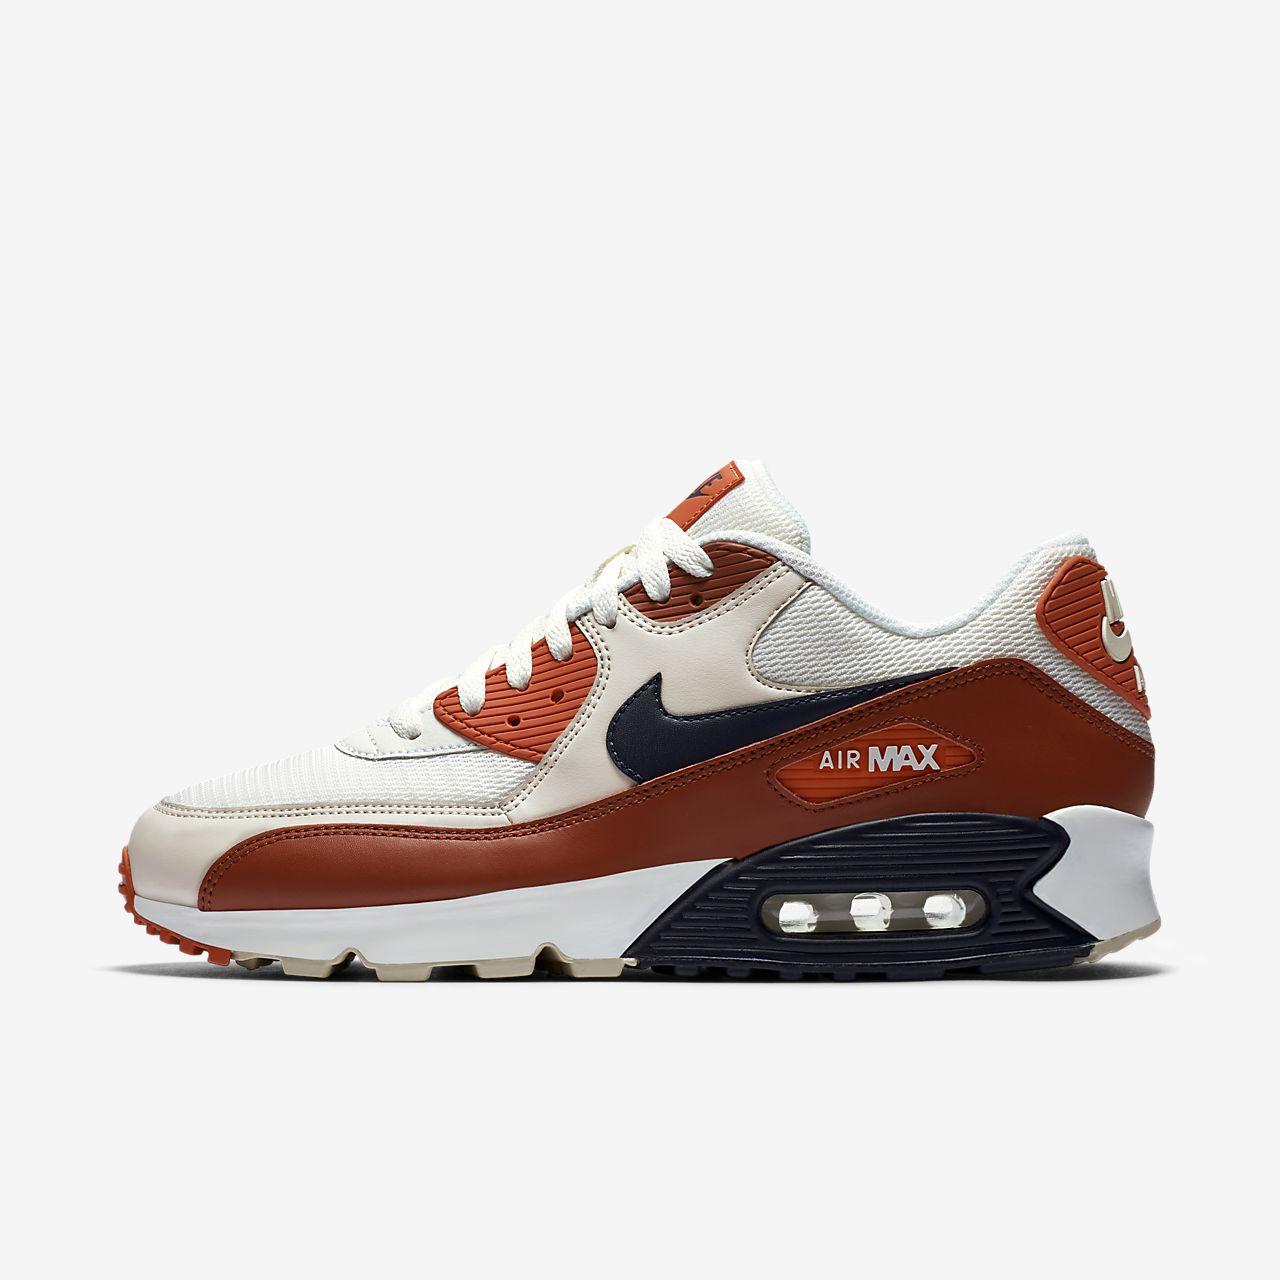 11d167faef get 2016 offer mens shoes air max 90 hyperfuse qs premium trainers grey  blue a11db e3038; low cost nike air max 90 id damenschuh cream 58621 d39de